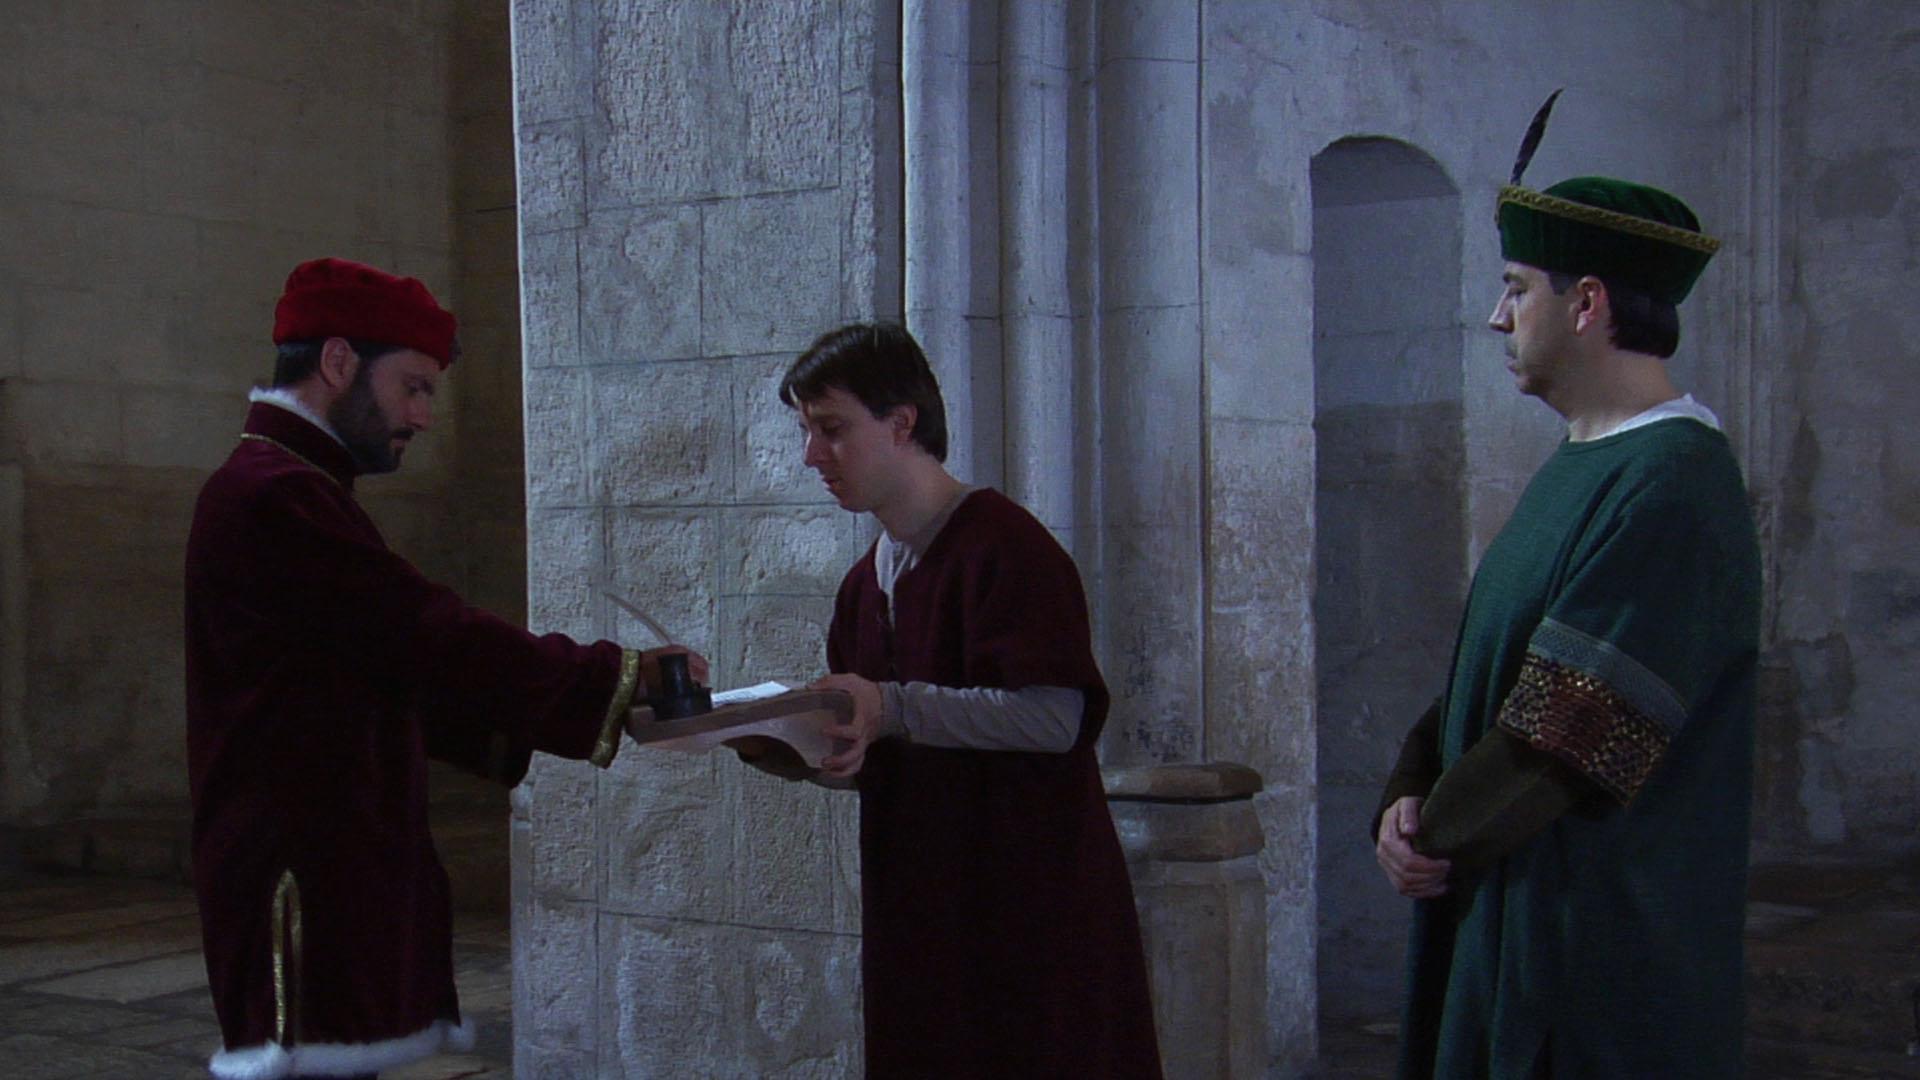 El rei firma la carta